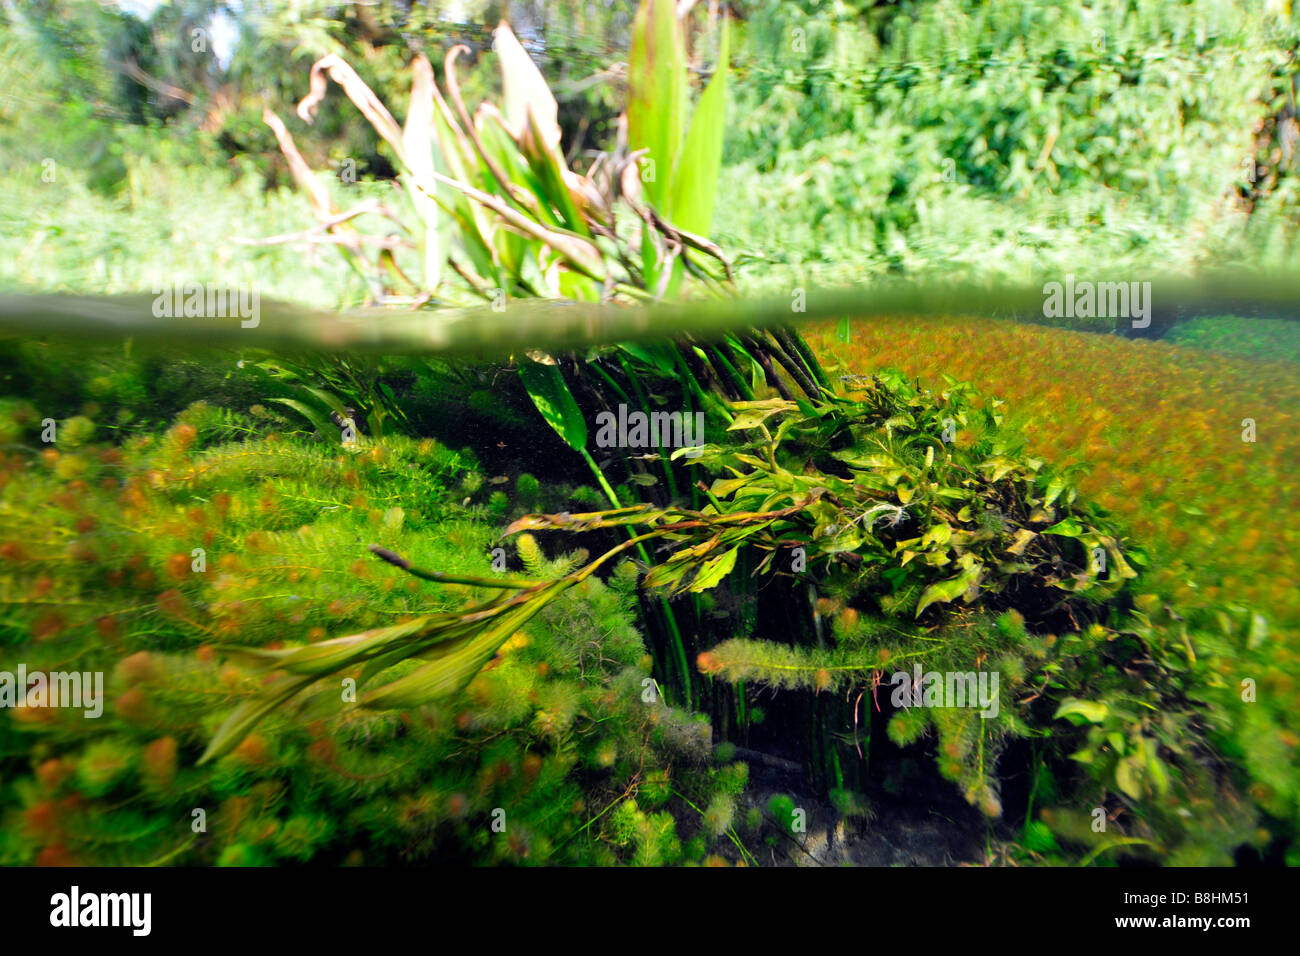 Split image of the lush vegetation above and bellow water, Sucuri river,  Bonito, Mato Grosso do Sul, Brazil - Stock Image